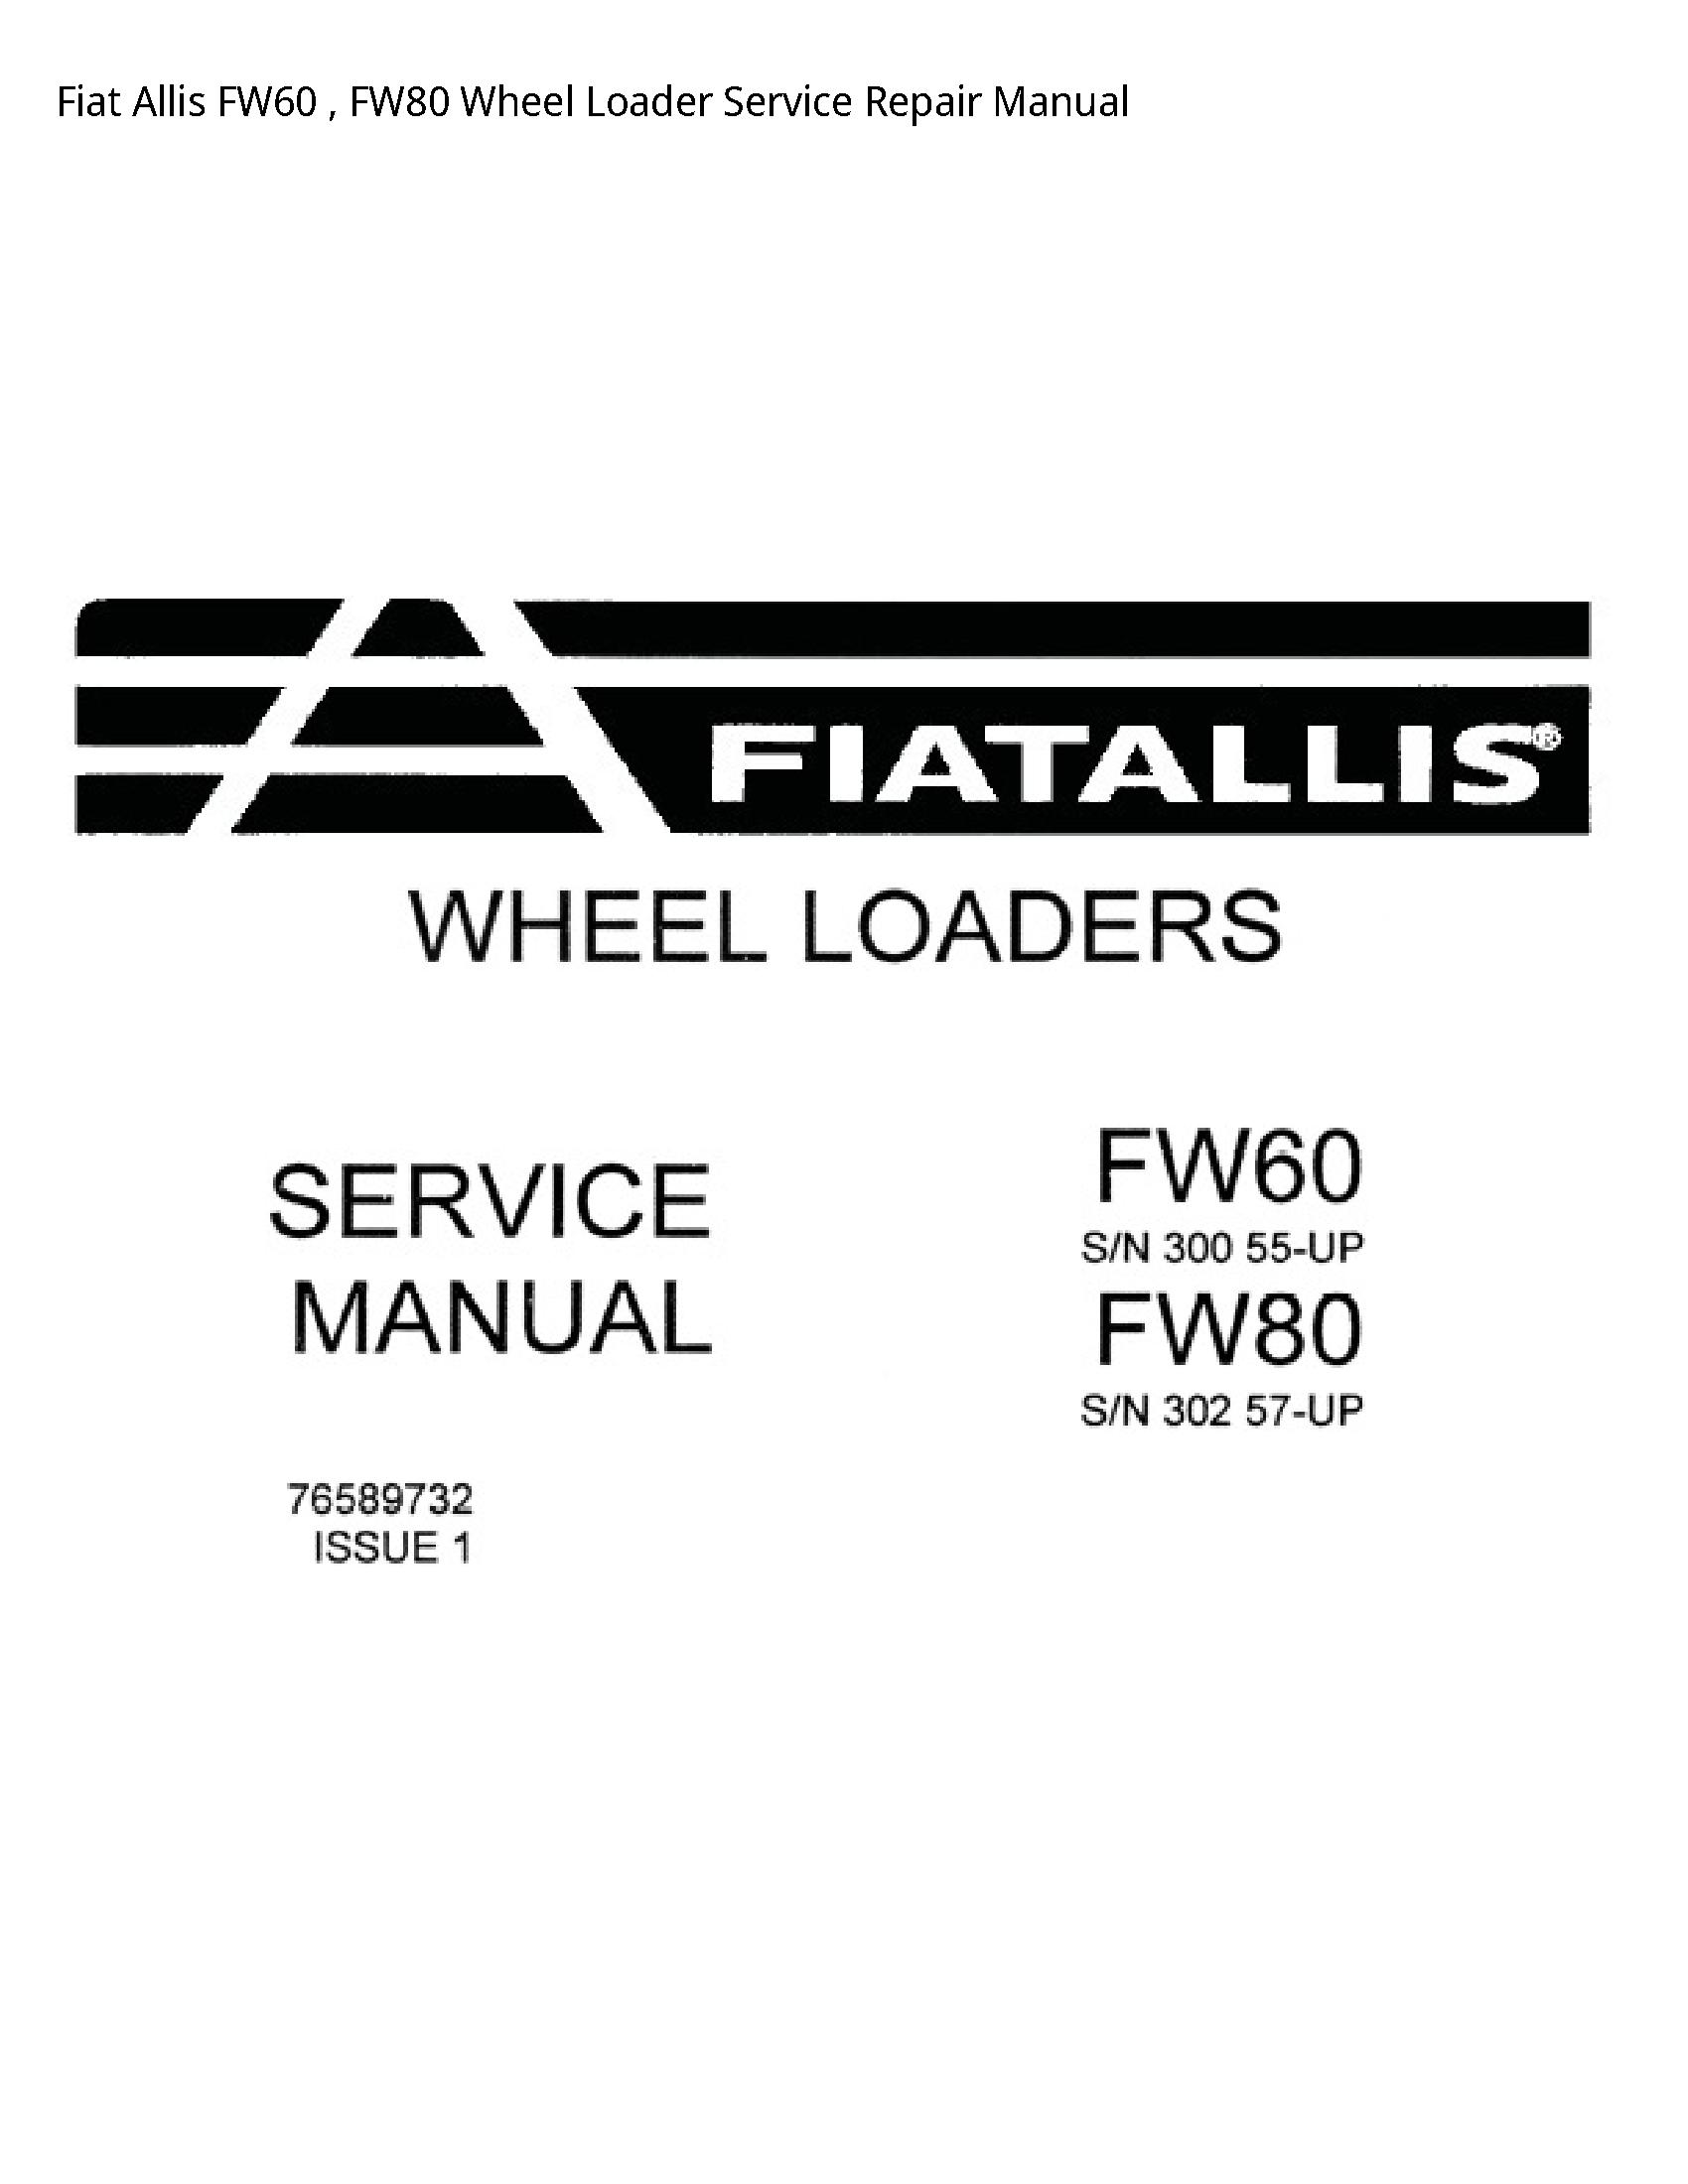 Fiat Allis FW60 Wheel Loader manual